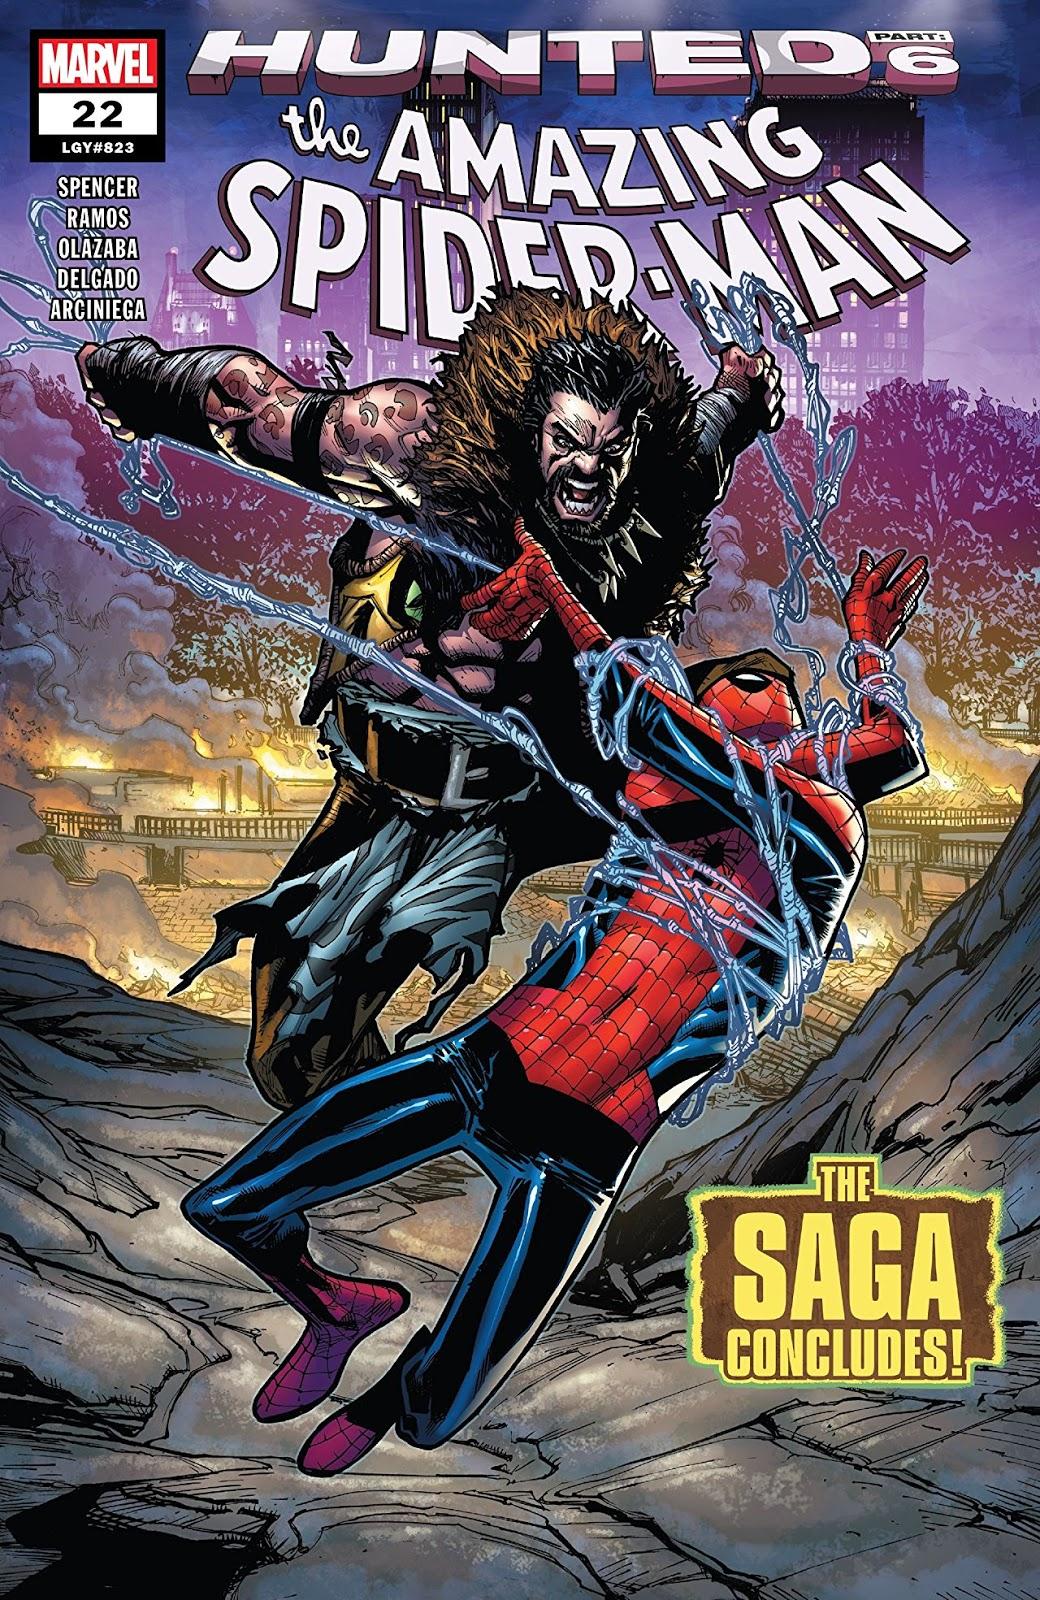 Top 10 Grand Comics This Week - #22 - The Geek Twins